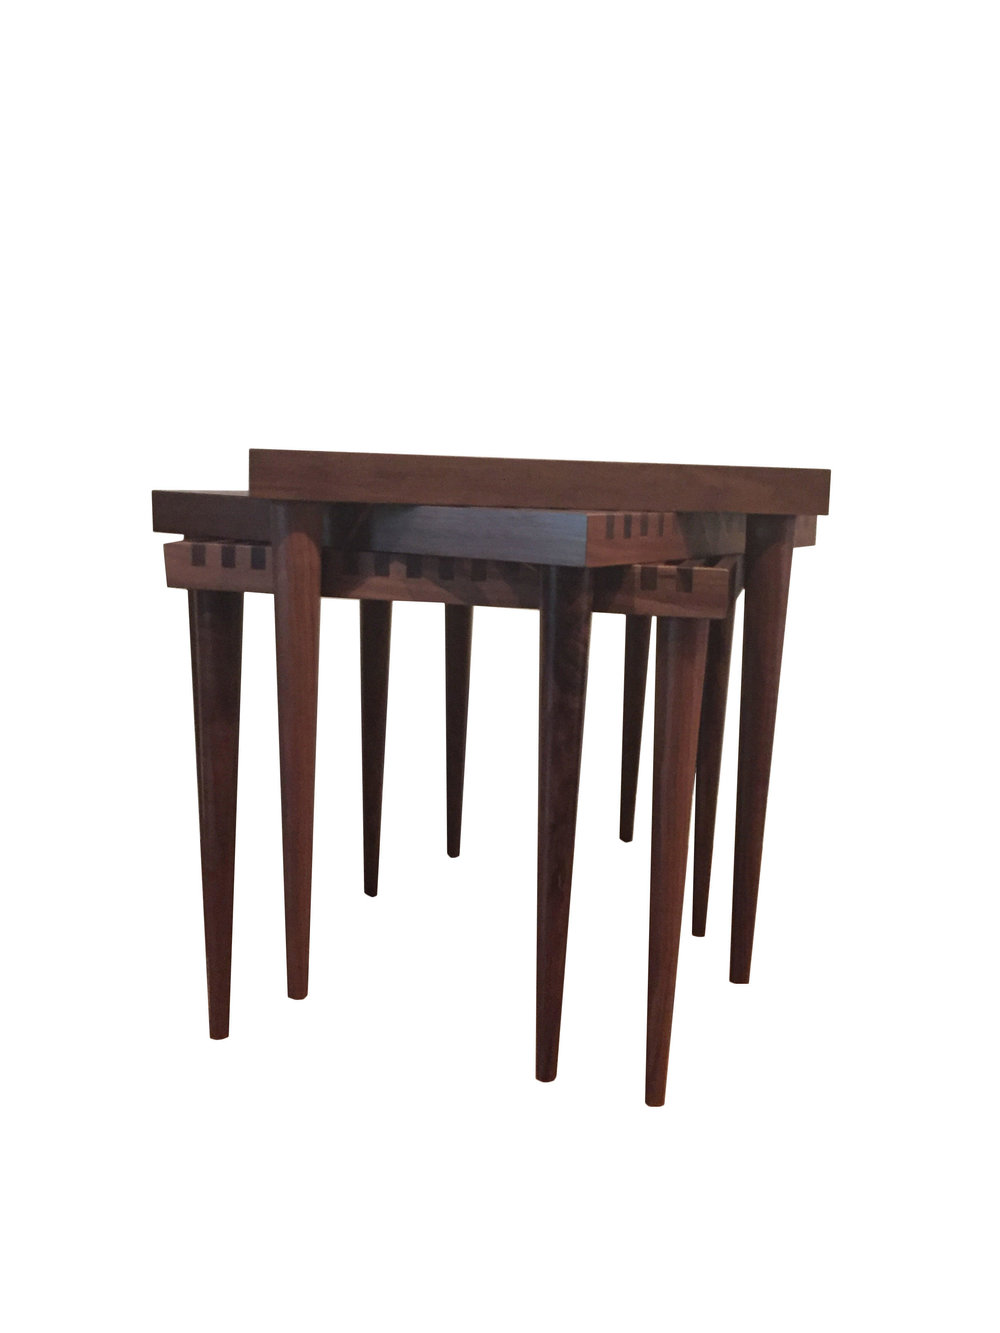 smilow-furniture-slatted-stacking-table-1-1.jpg